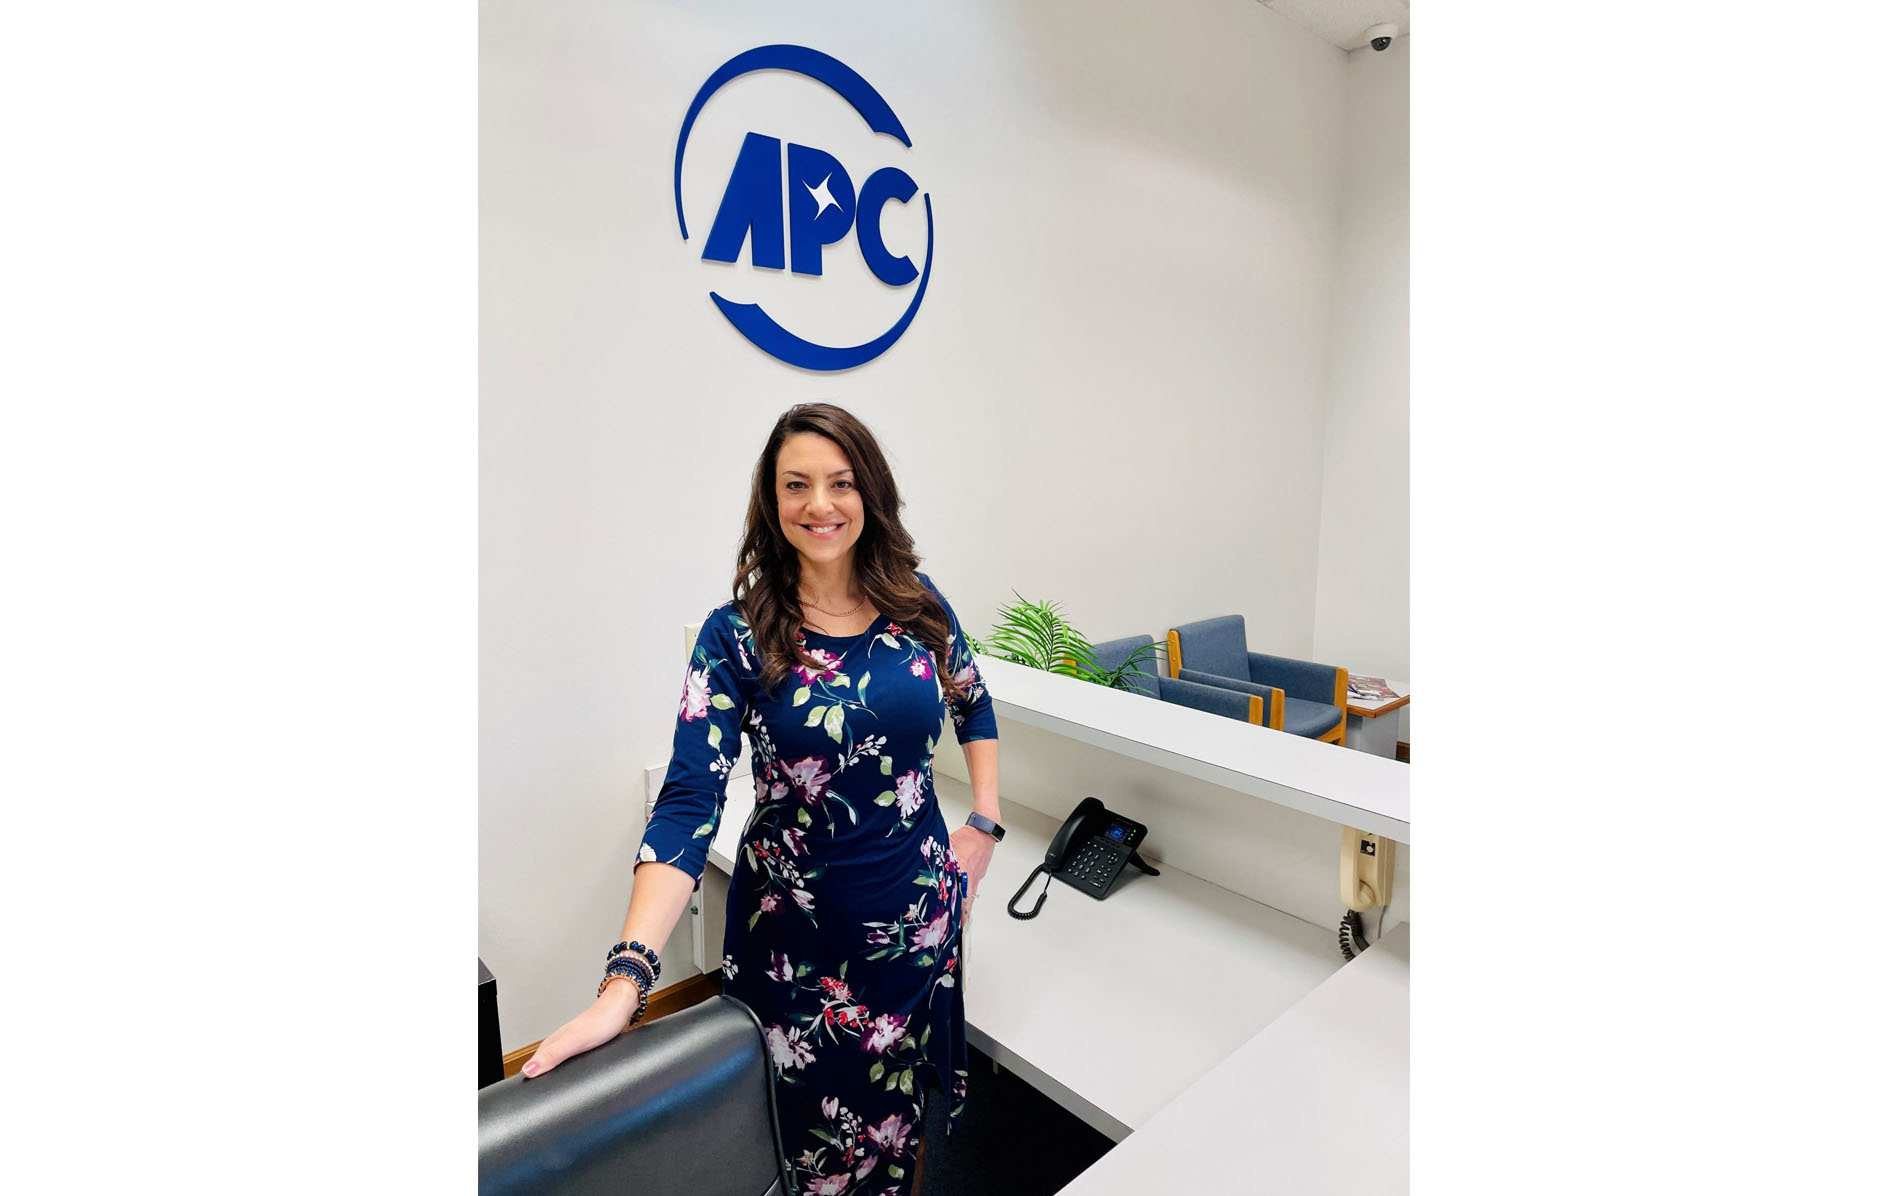 APC office attendant - happy lady